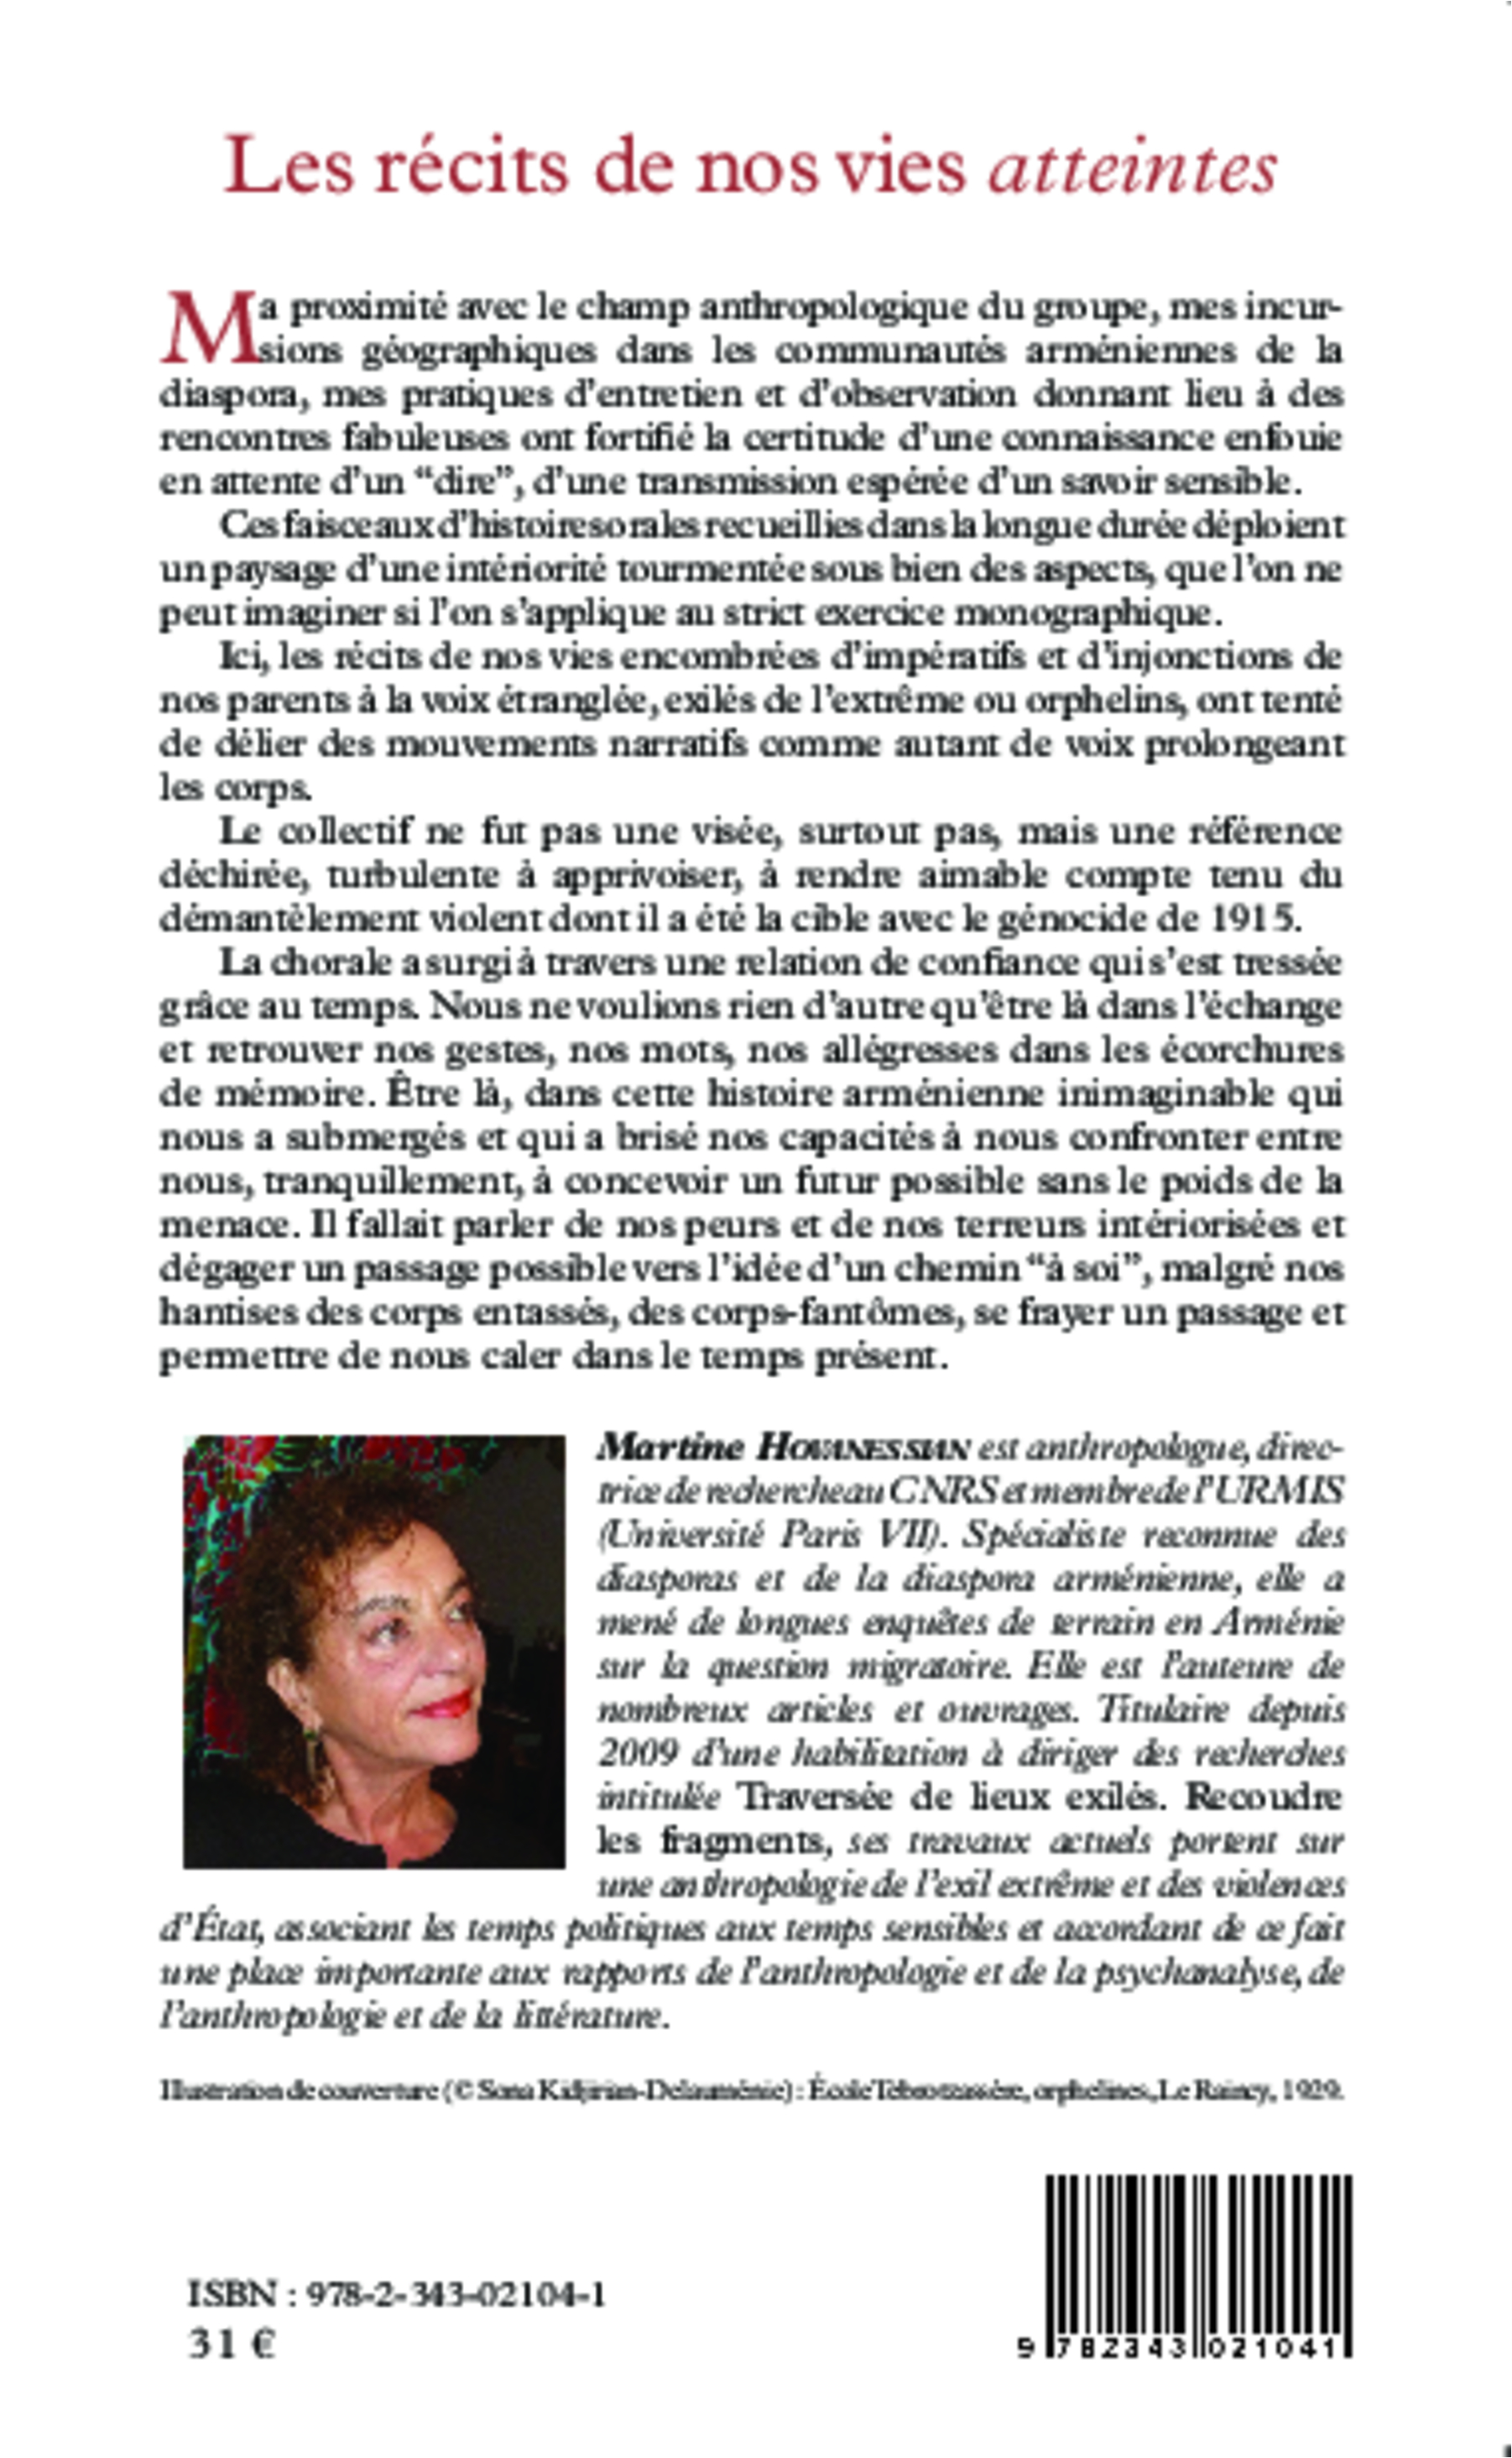 http://www.editions-harmattan.fr/catalogue/couv/9782343021041v.jpg